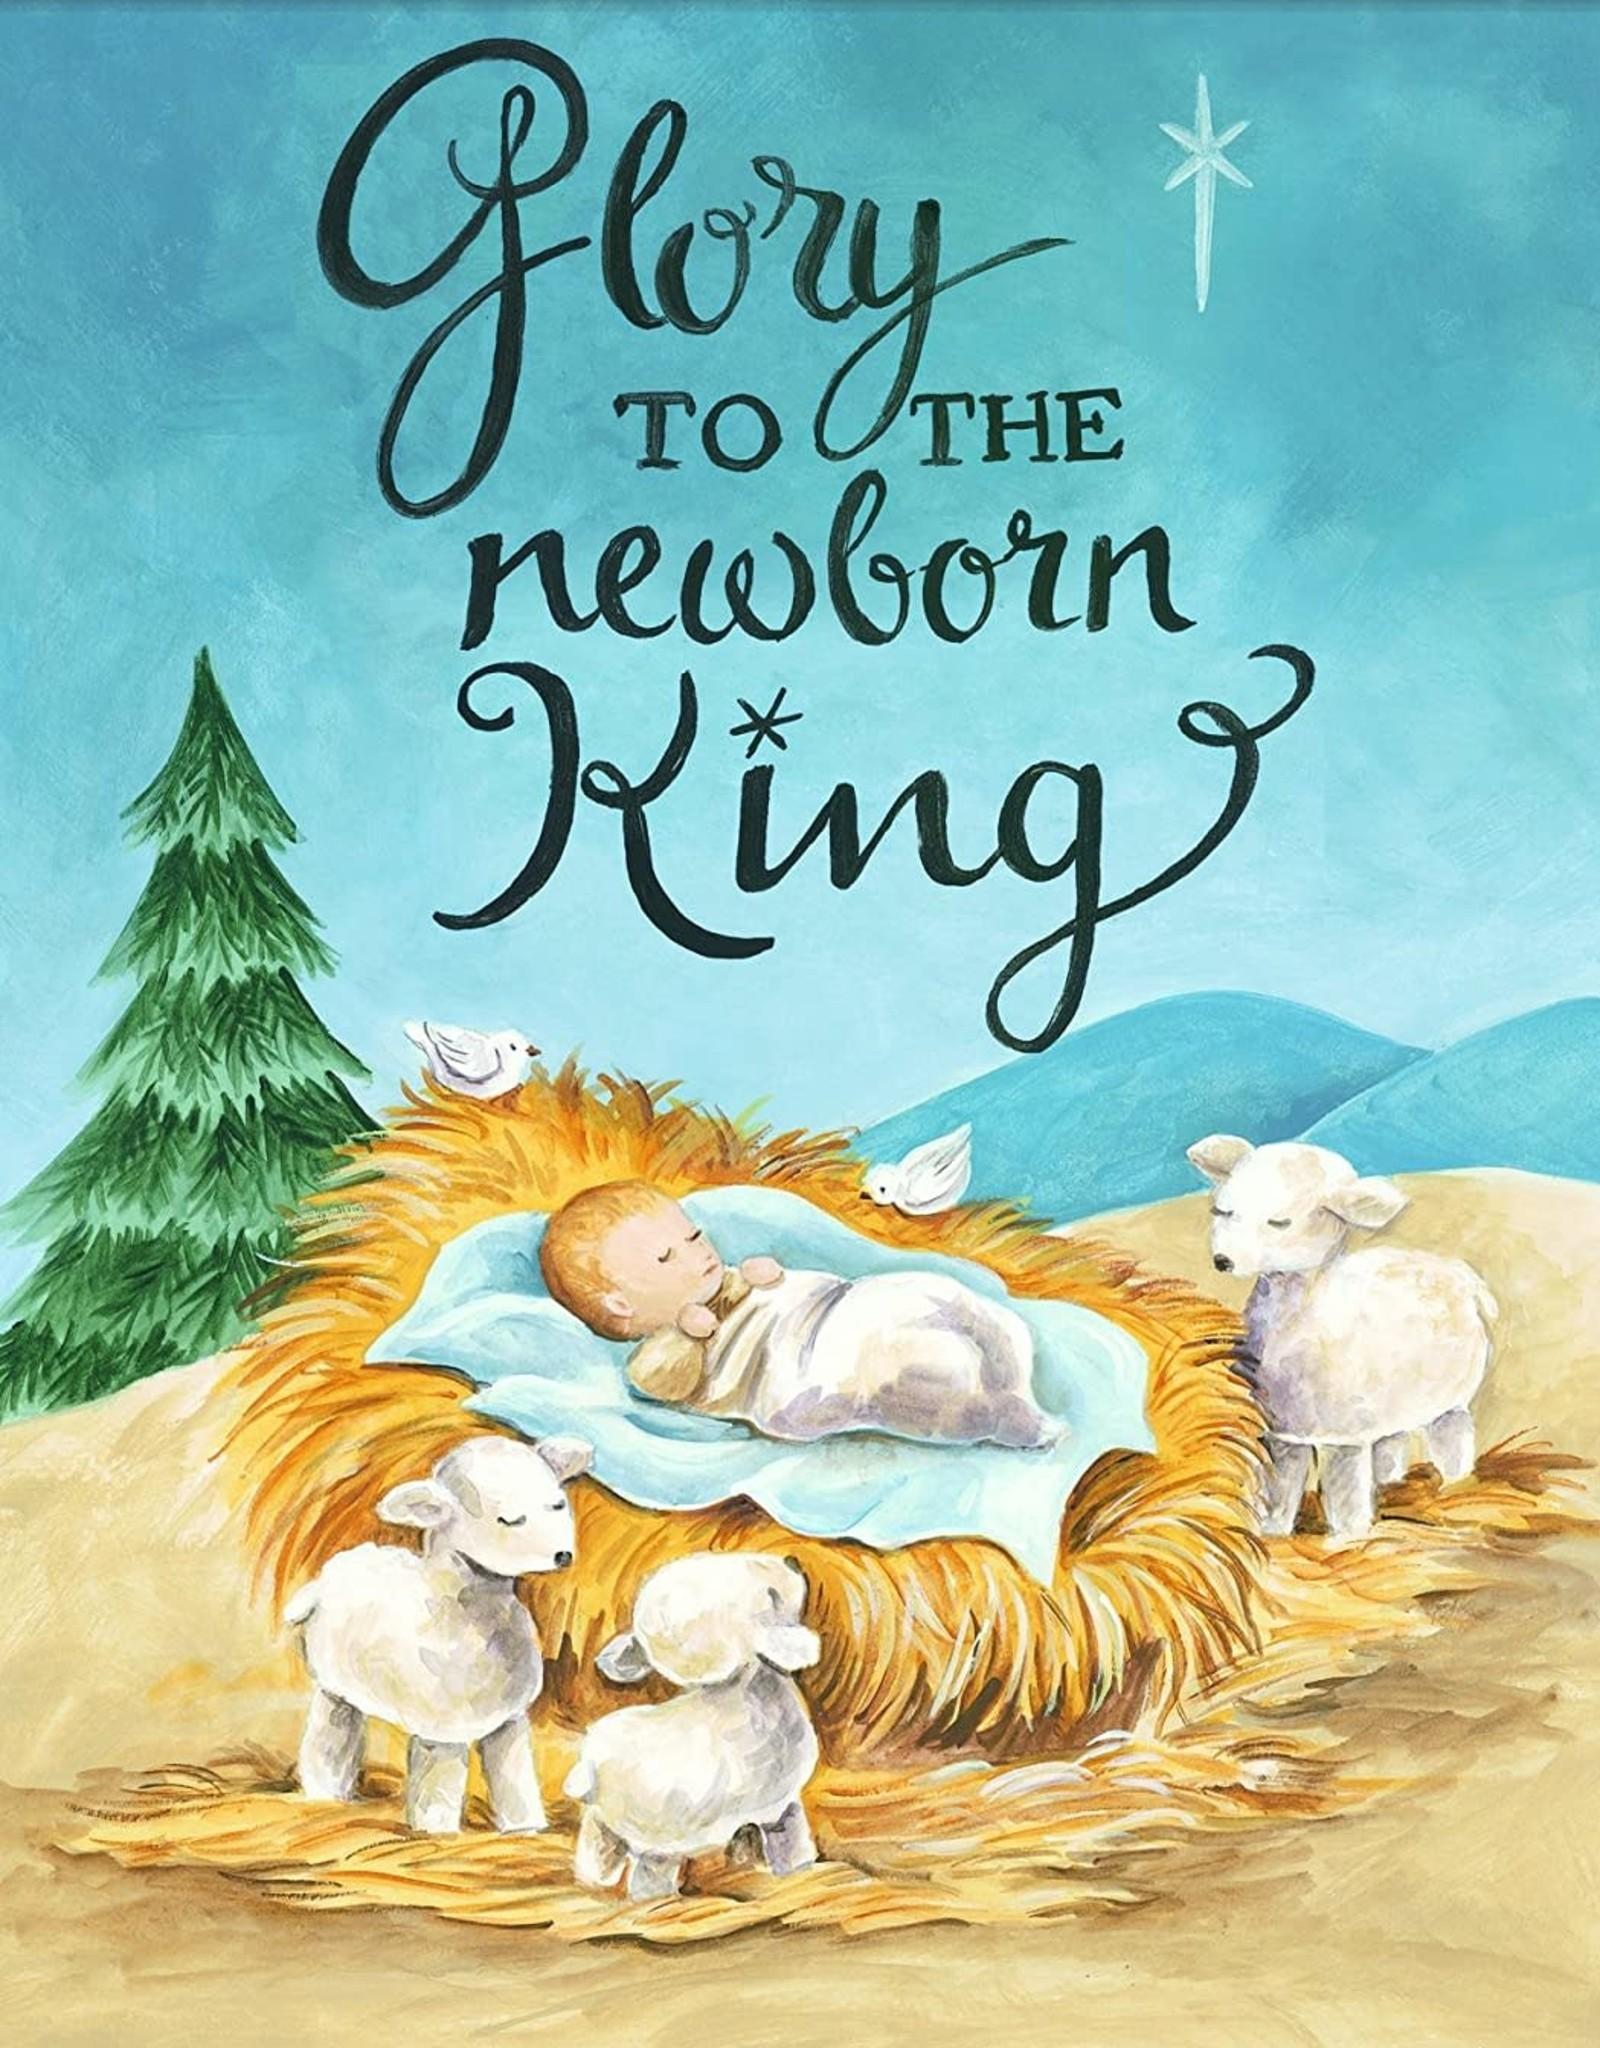 Carson C Newborn King GF